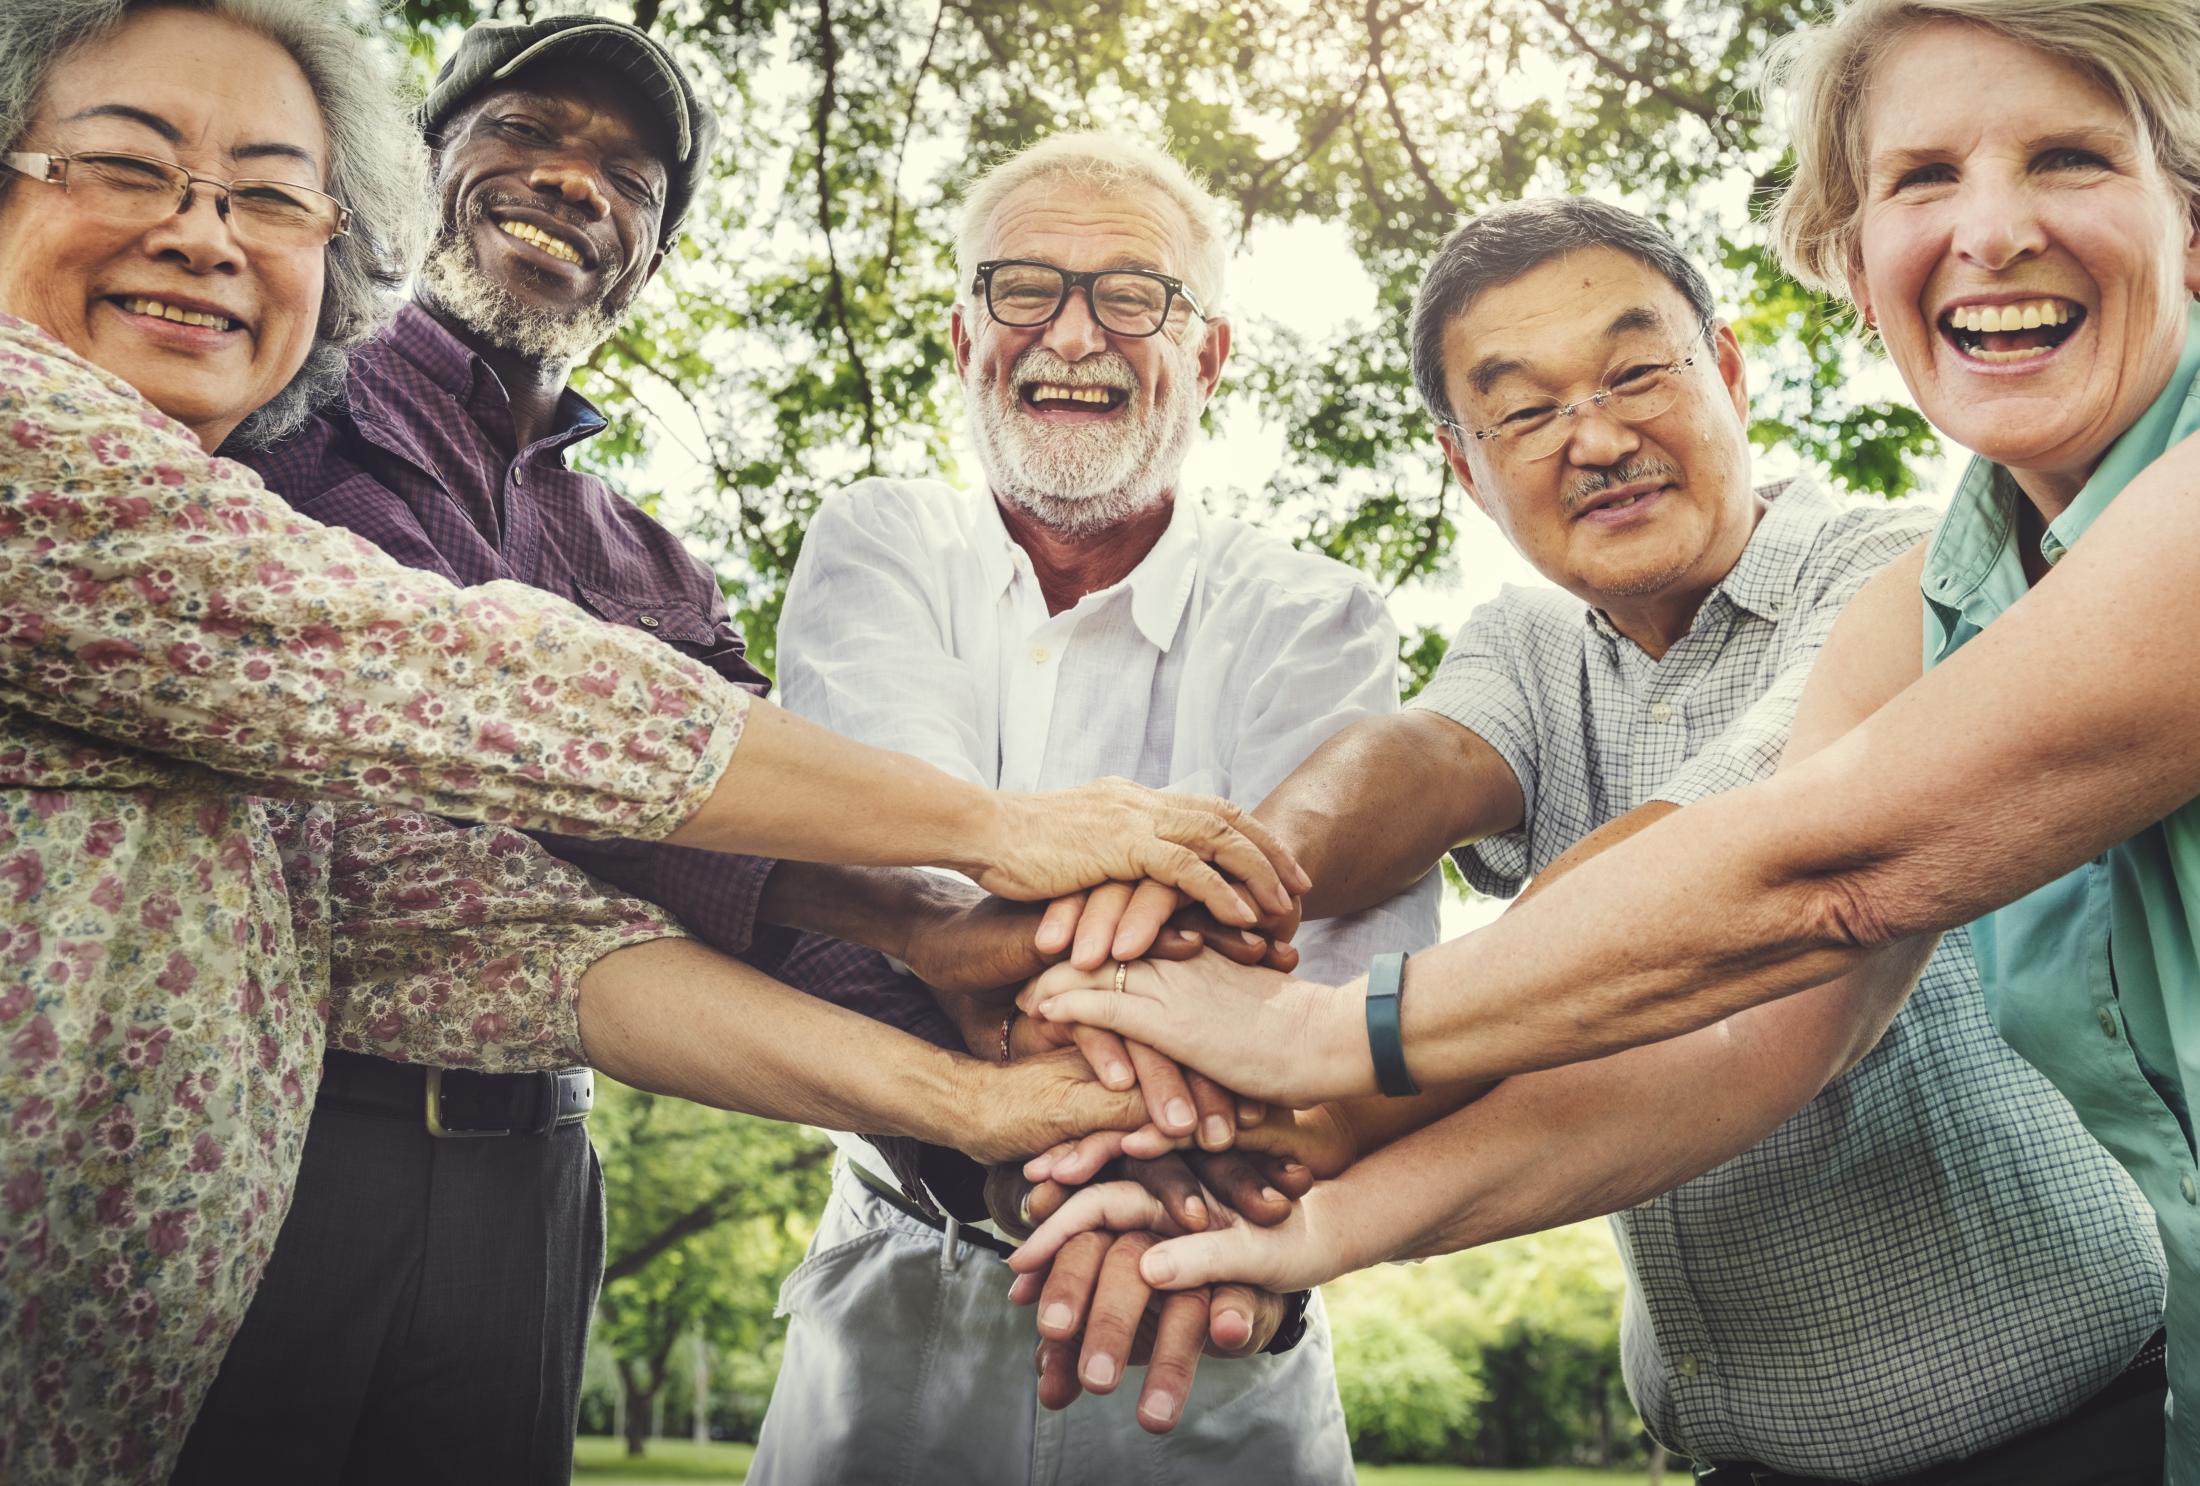 Promoting independence in older Canadians